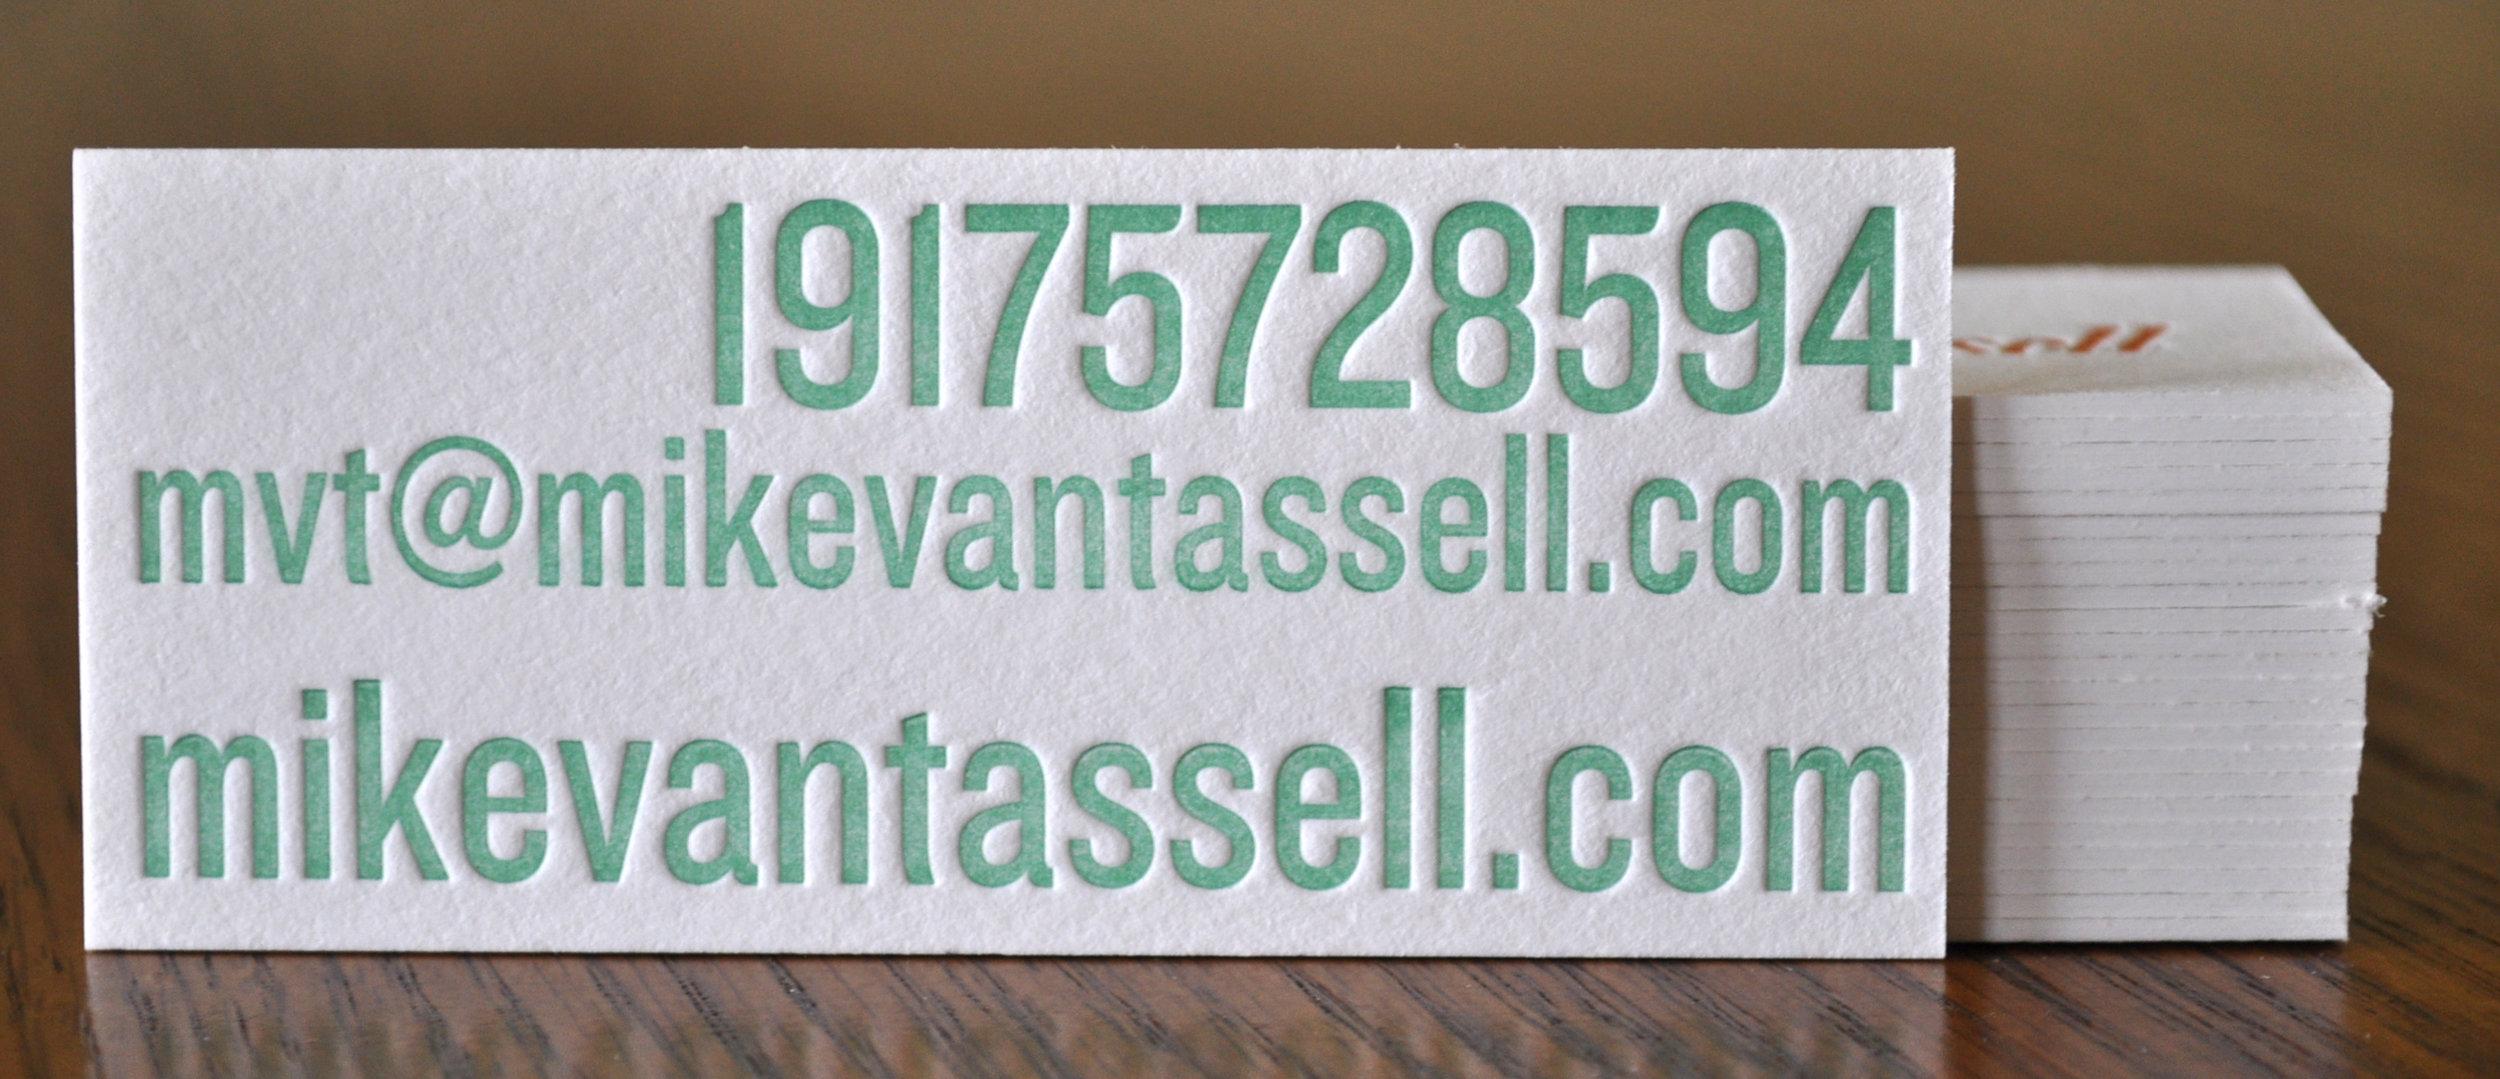 business-card-letterpress-4.JPG